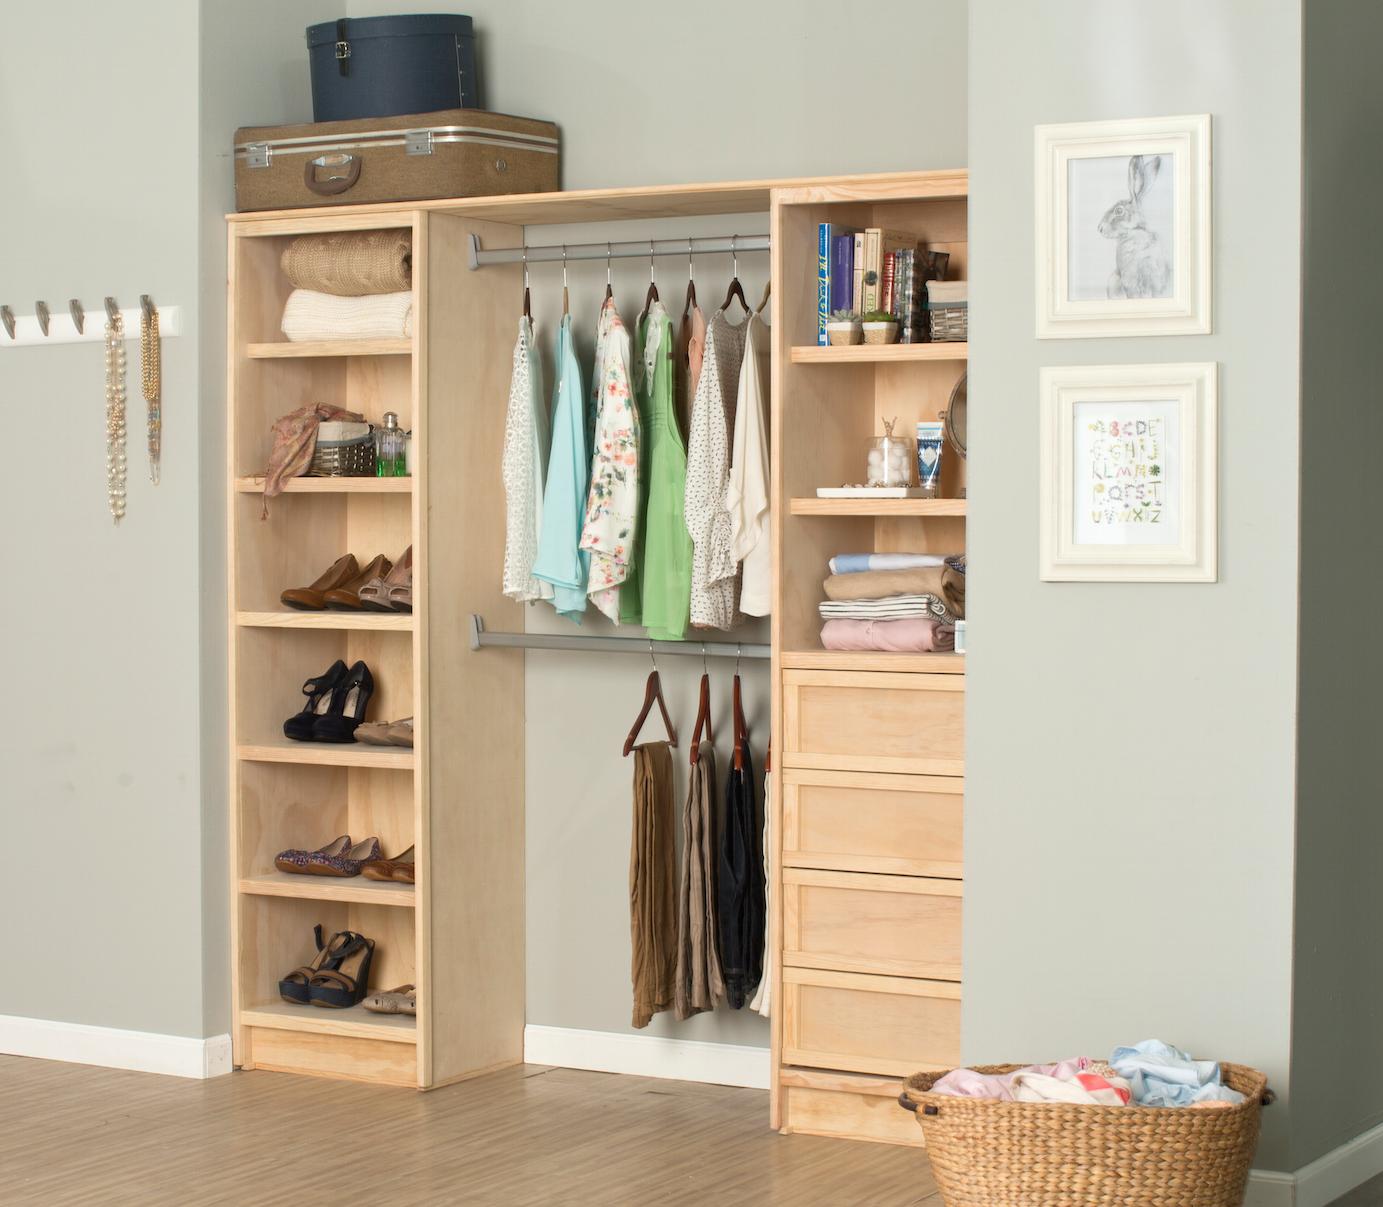 Paquete de cl set de pino cl set pino y accesorios for Closet de madera para dormitorios